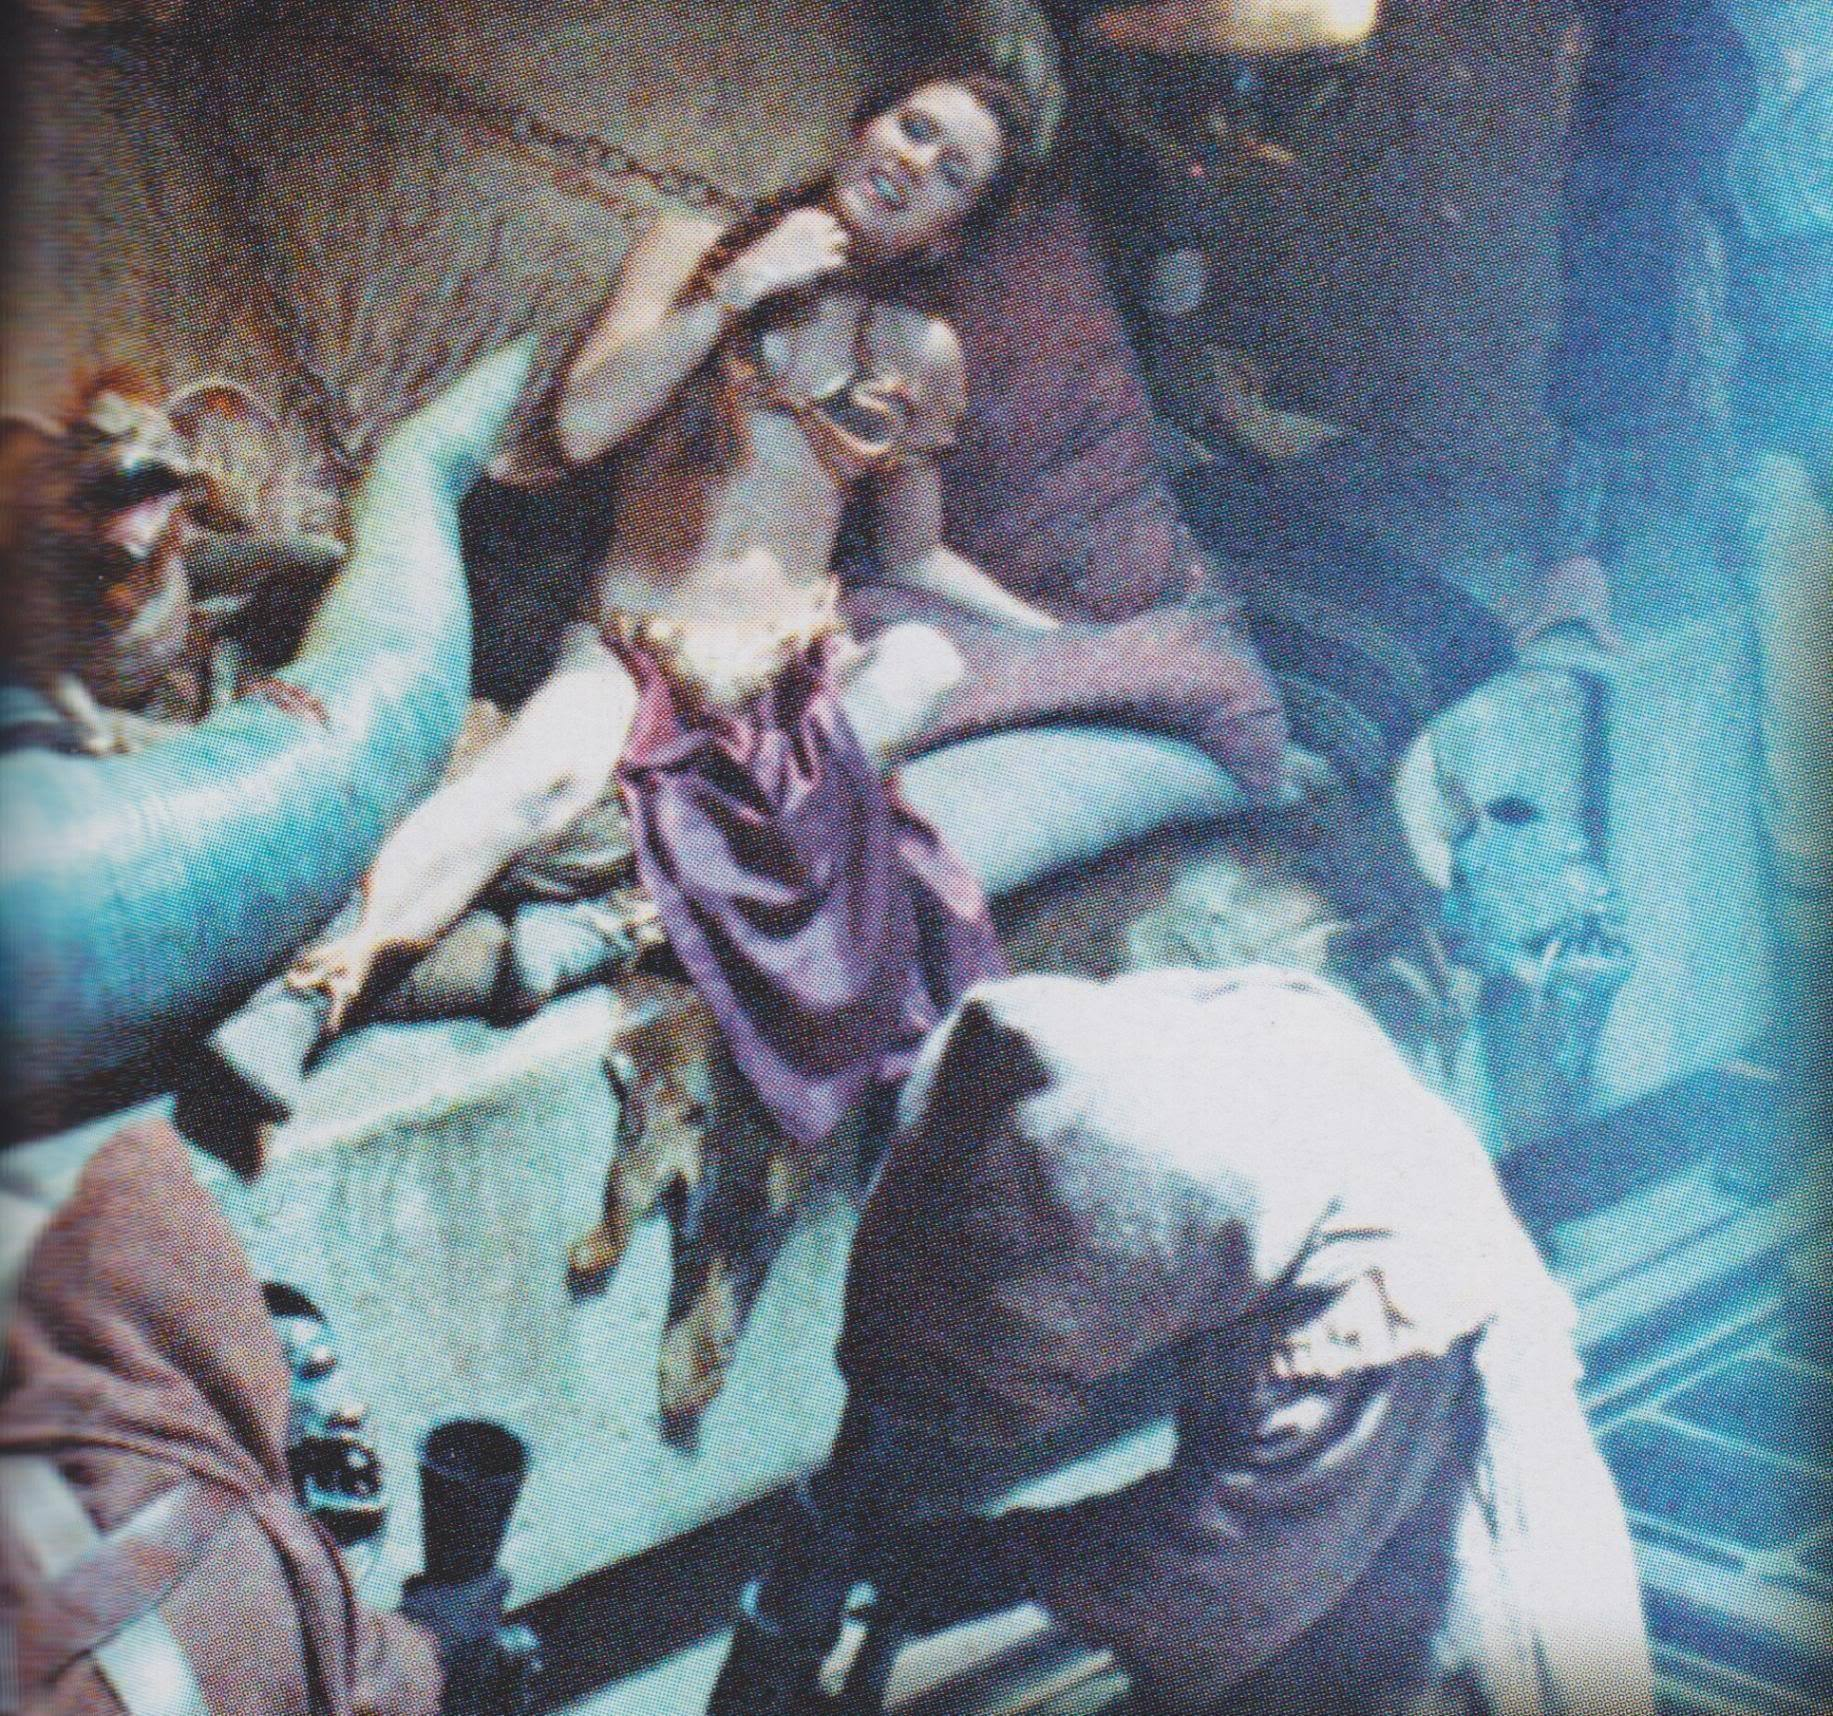 ... Slave-Leia-princess-leia-organa-solo-skywalker-11031358-1833-1716.jpg